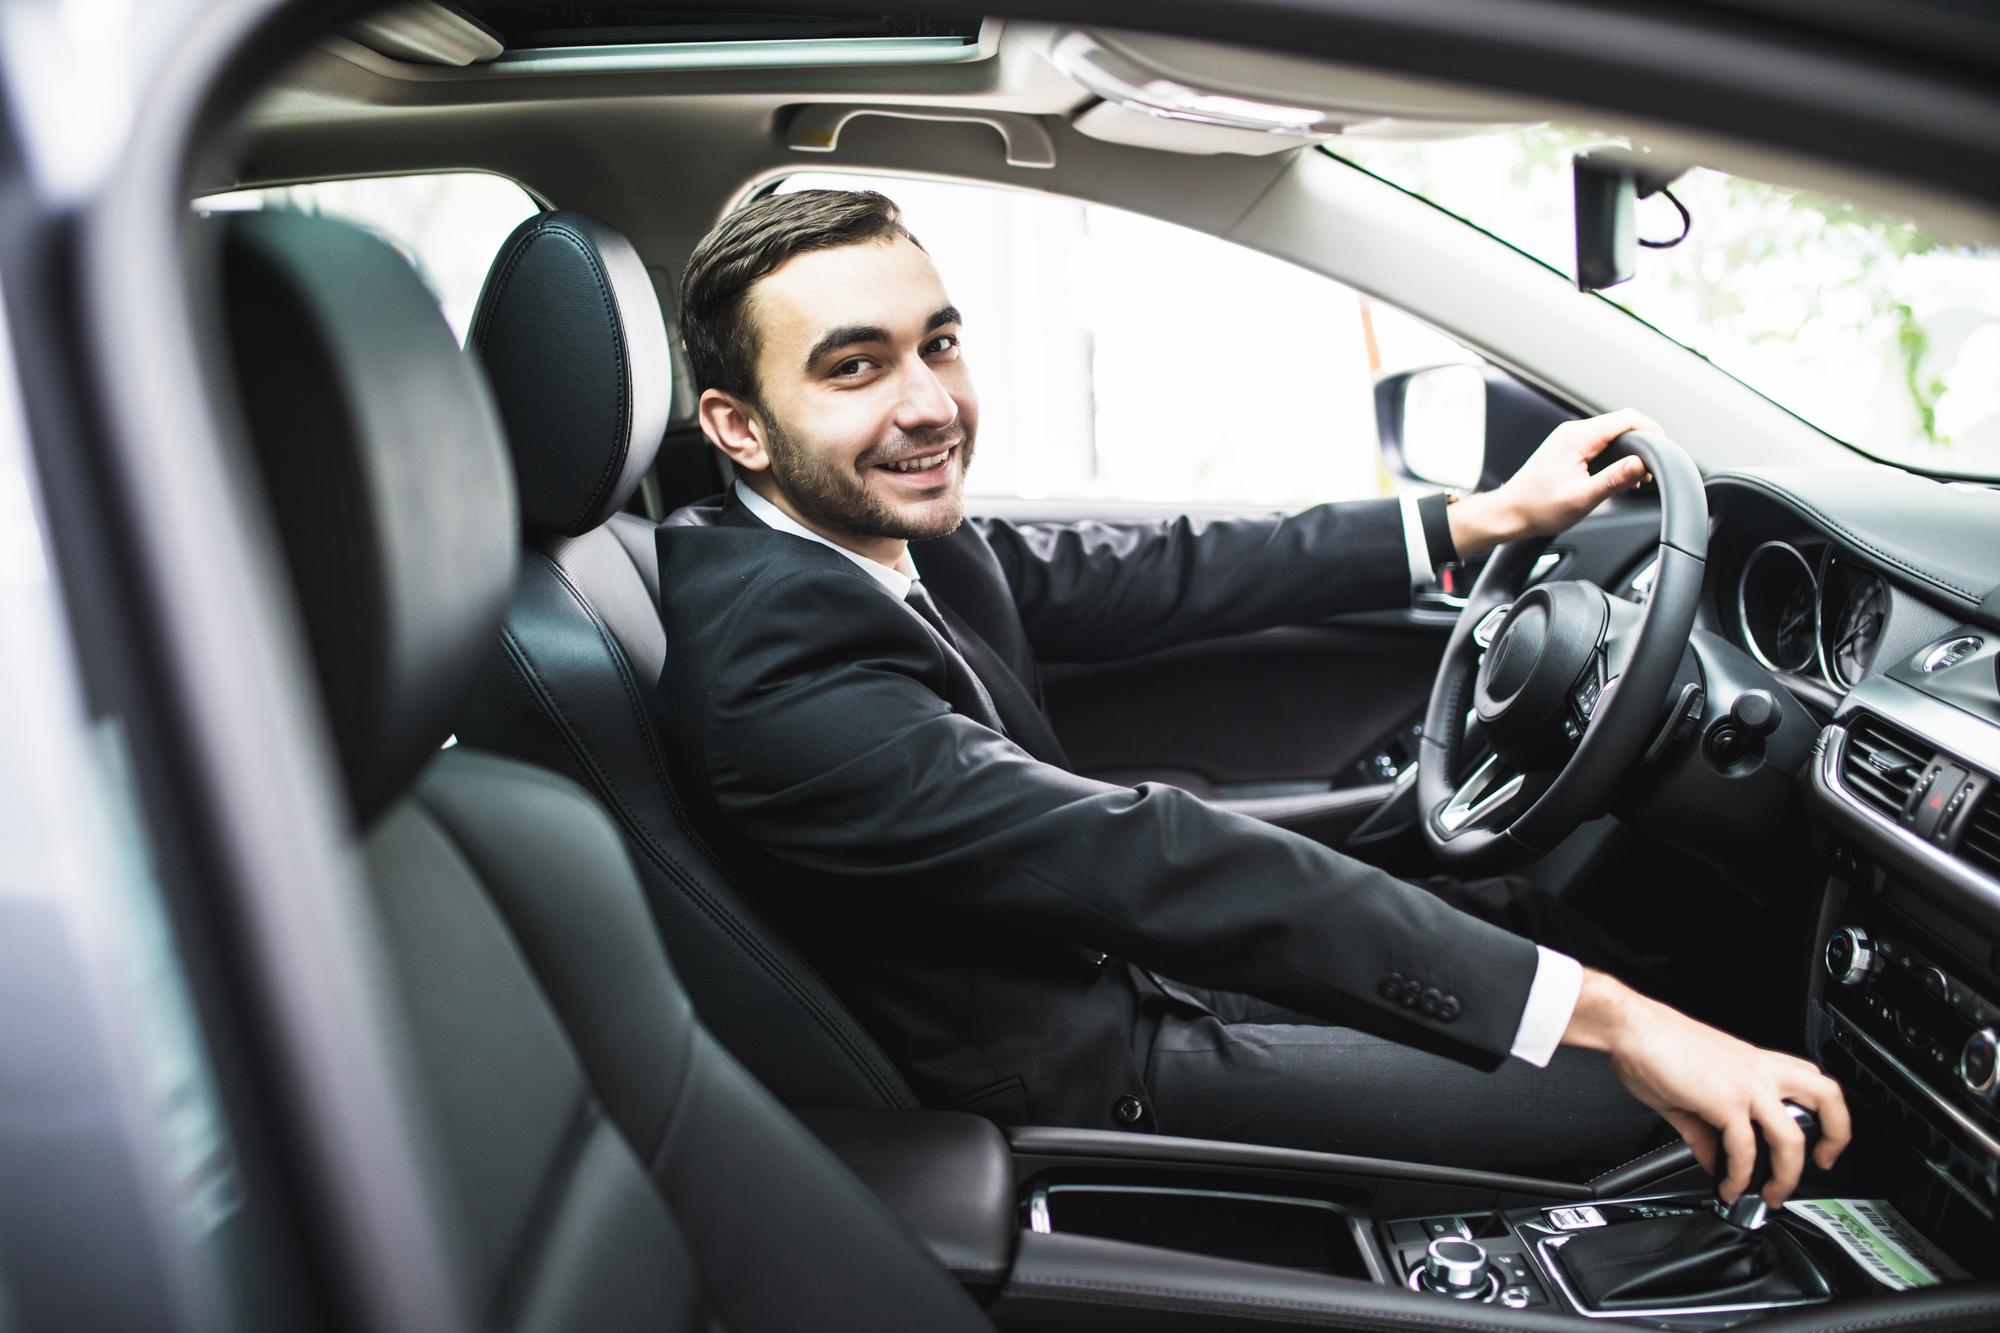 OIG Insurance Uber Insurance Ridesharing Insurance Lyft Insurance Driving for Hire